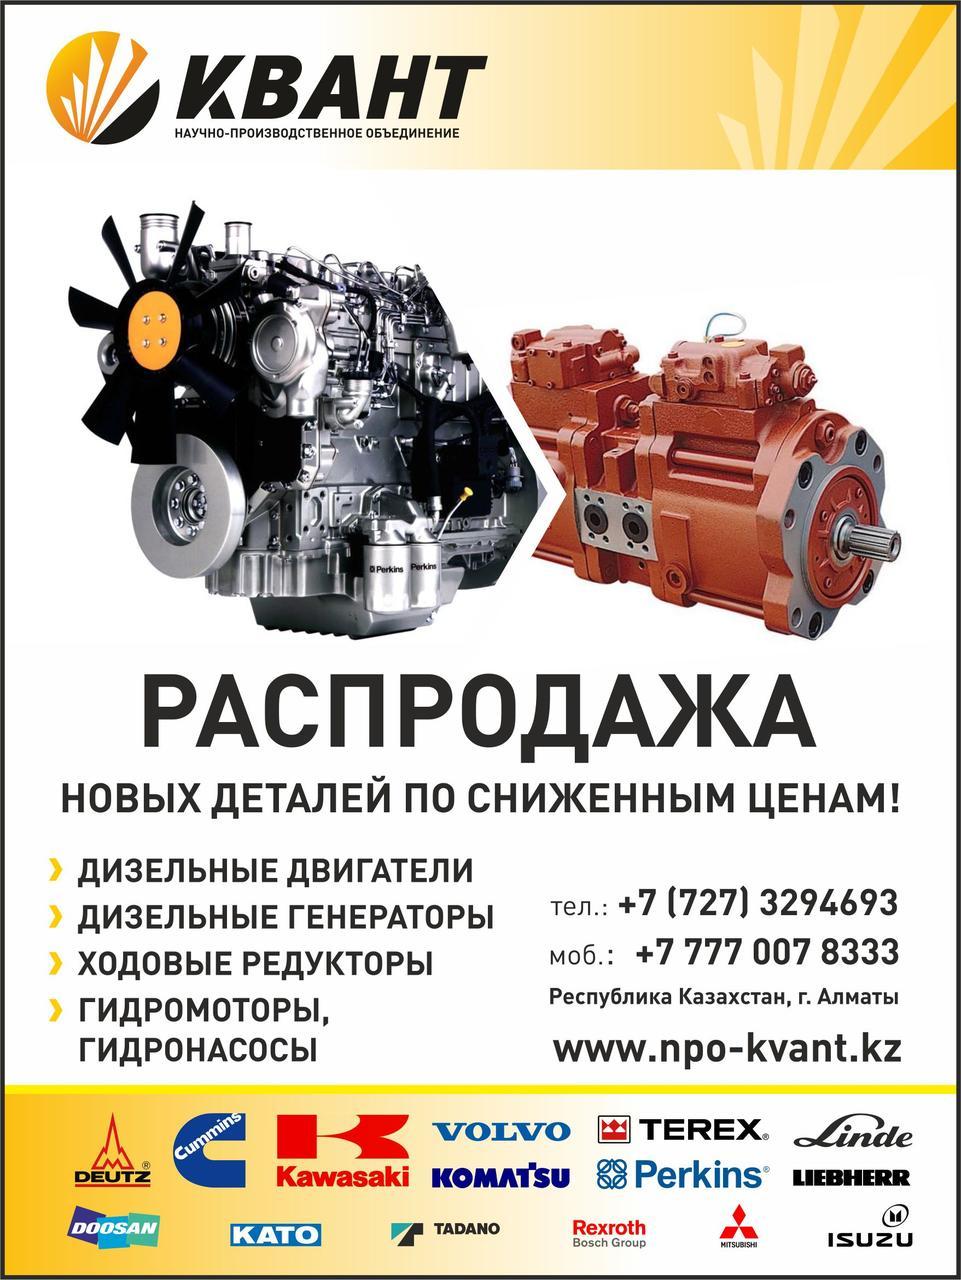 Двигатель Mitsubishi S12R-PTK, Mitsubishi S12R-PTA2, Mitsubishi S12R-PTK2, Mitsubishi S12R-V2PTK